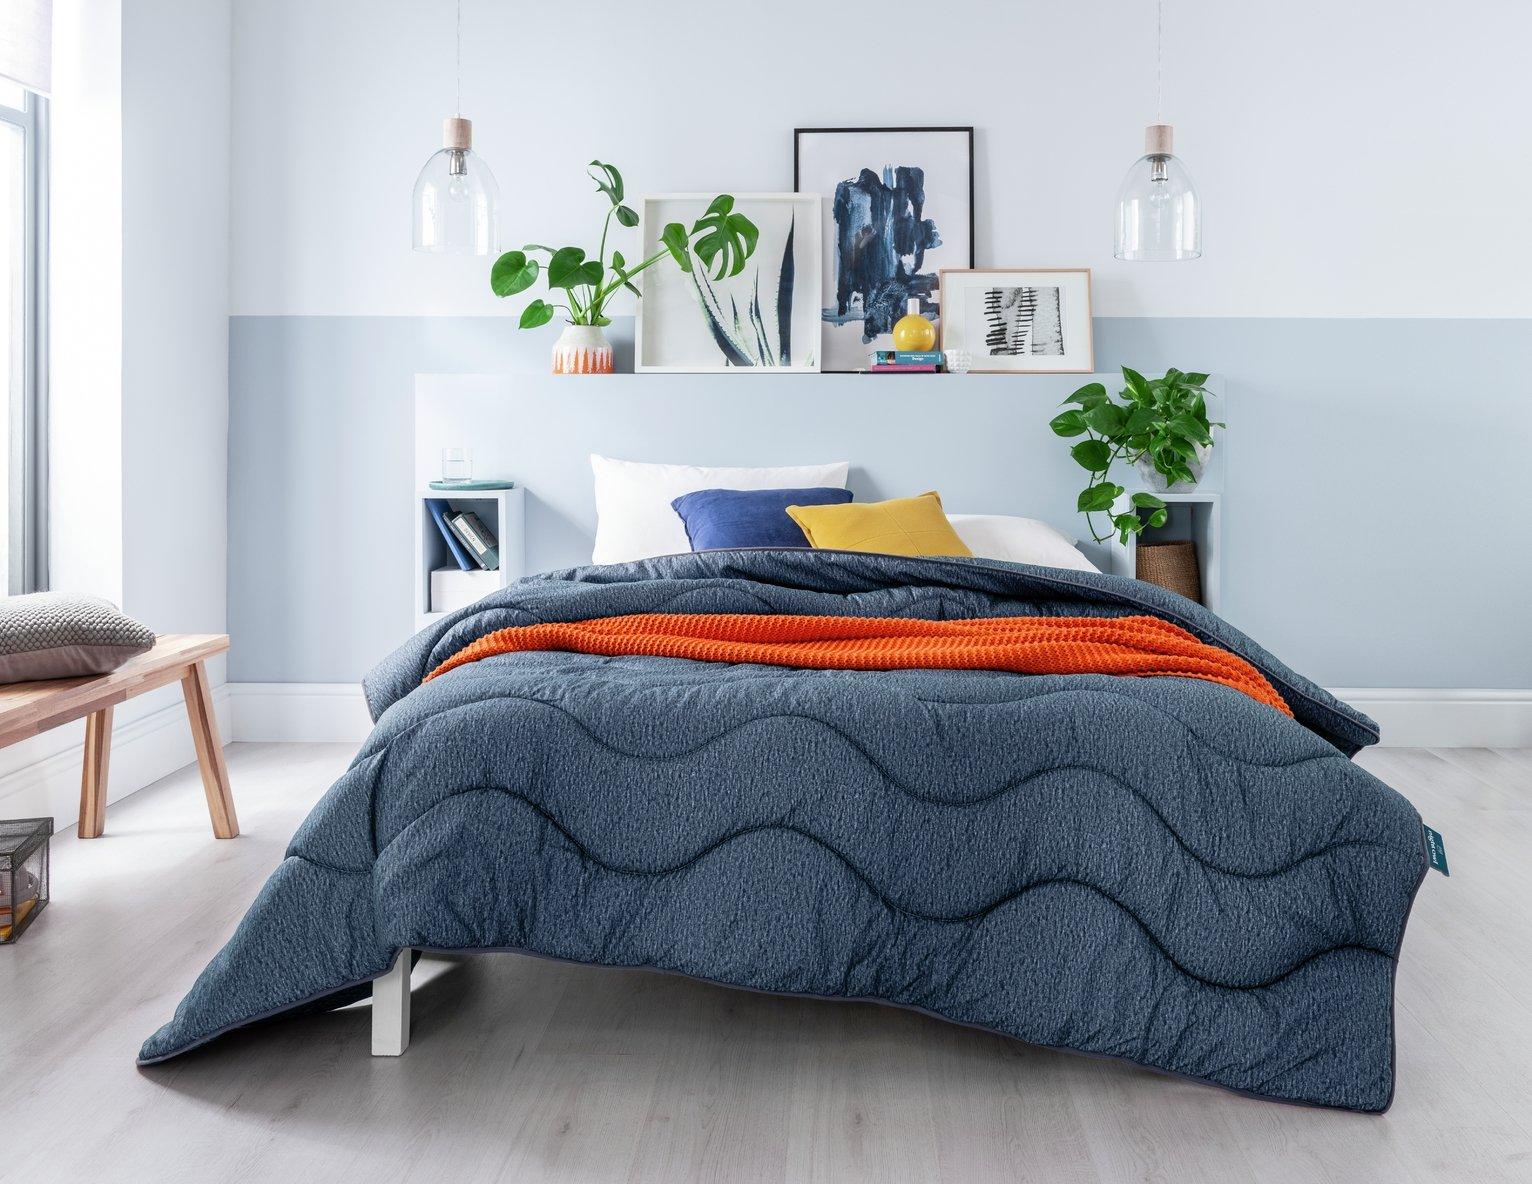 Coverless Duvet  10.5 Tog Single Size  Night Owl The Fine Bedding Co